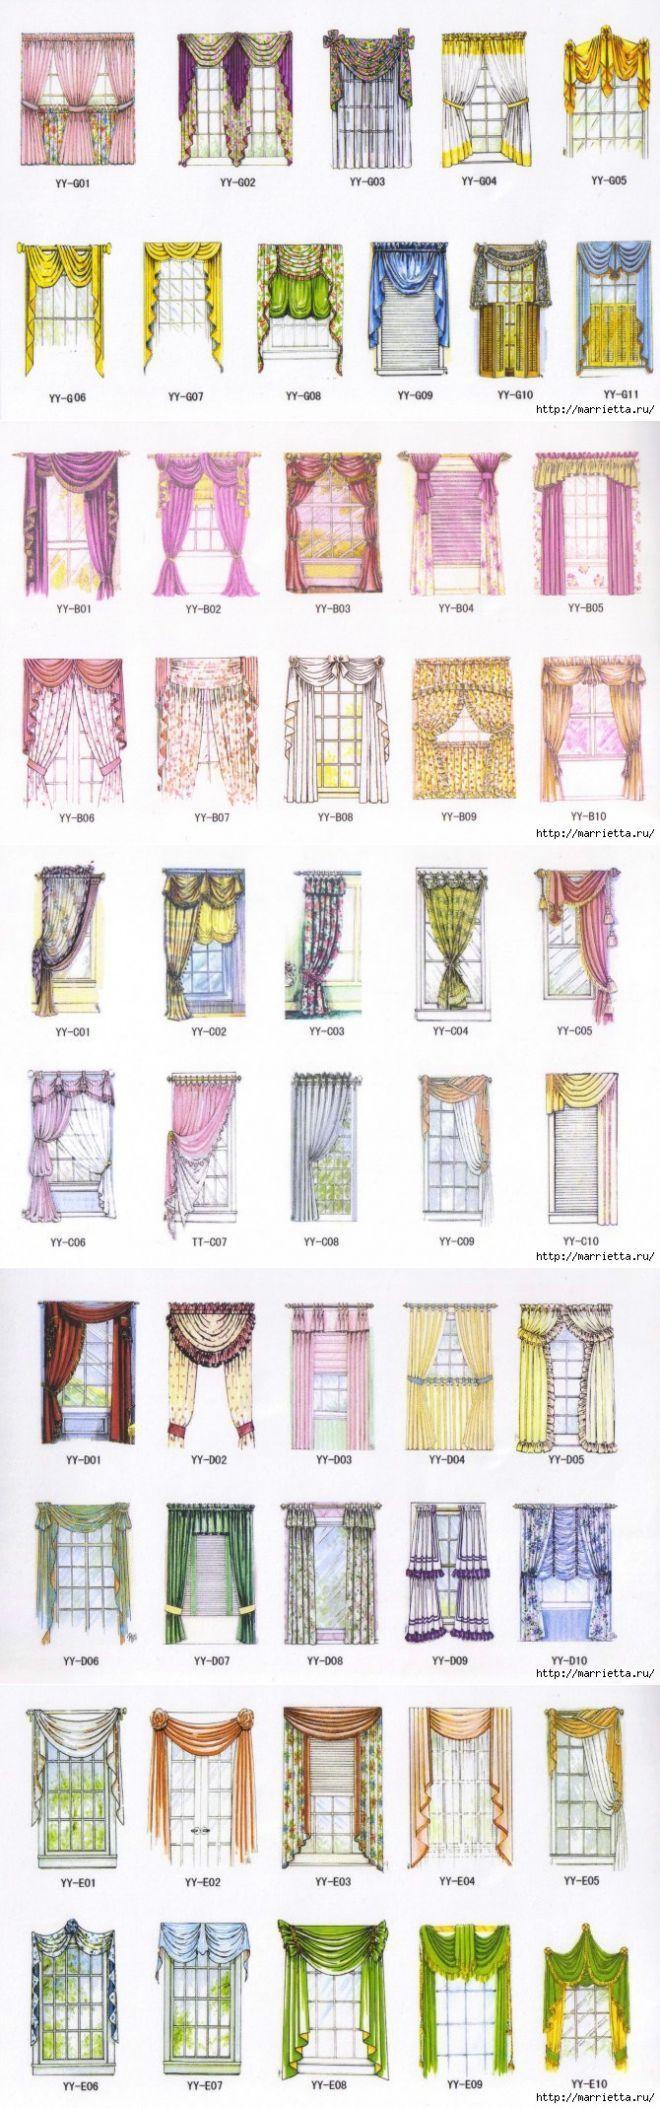 Types of curtains styles -  Curtain Stylescurtain